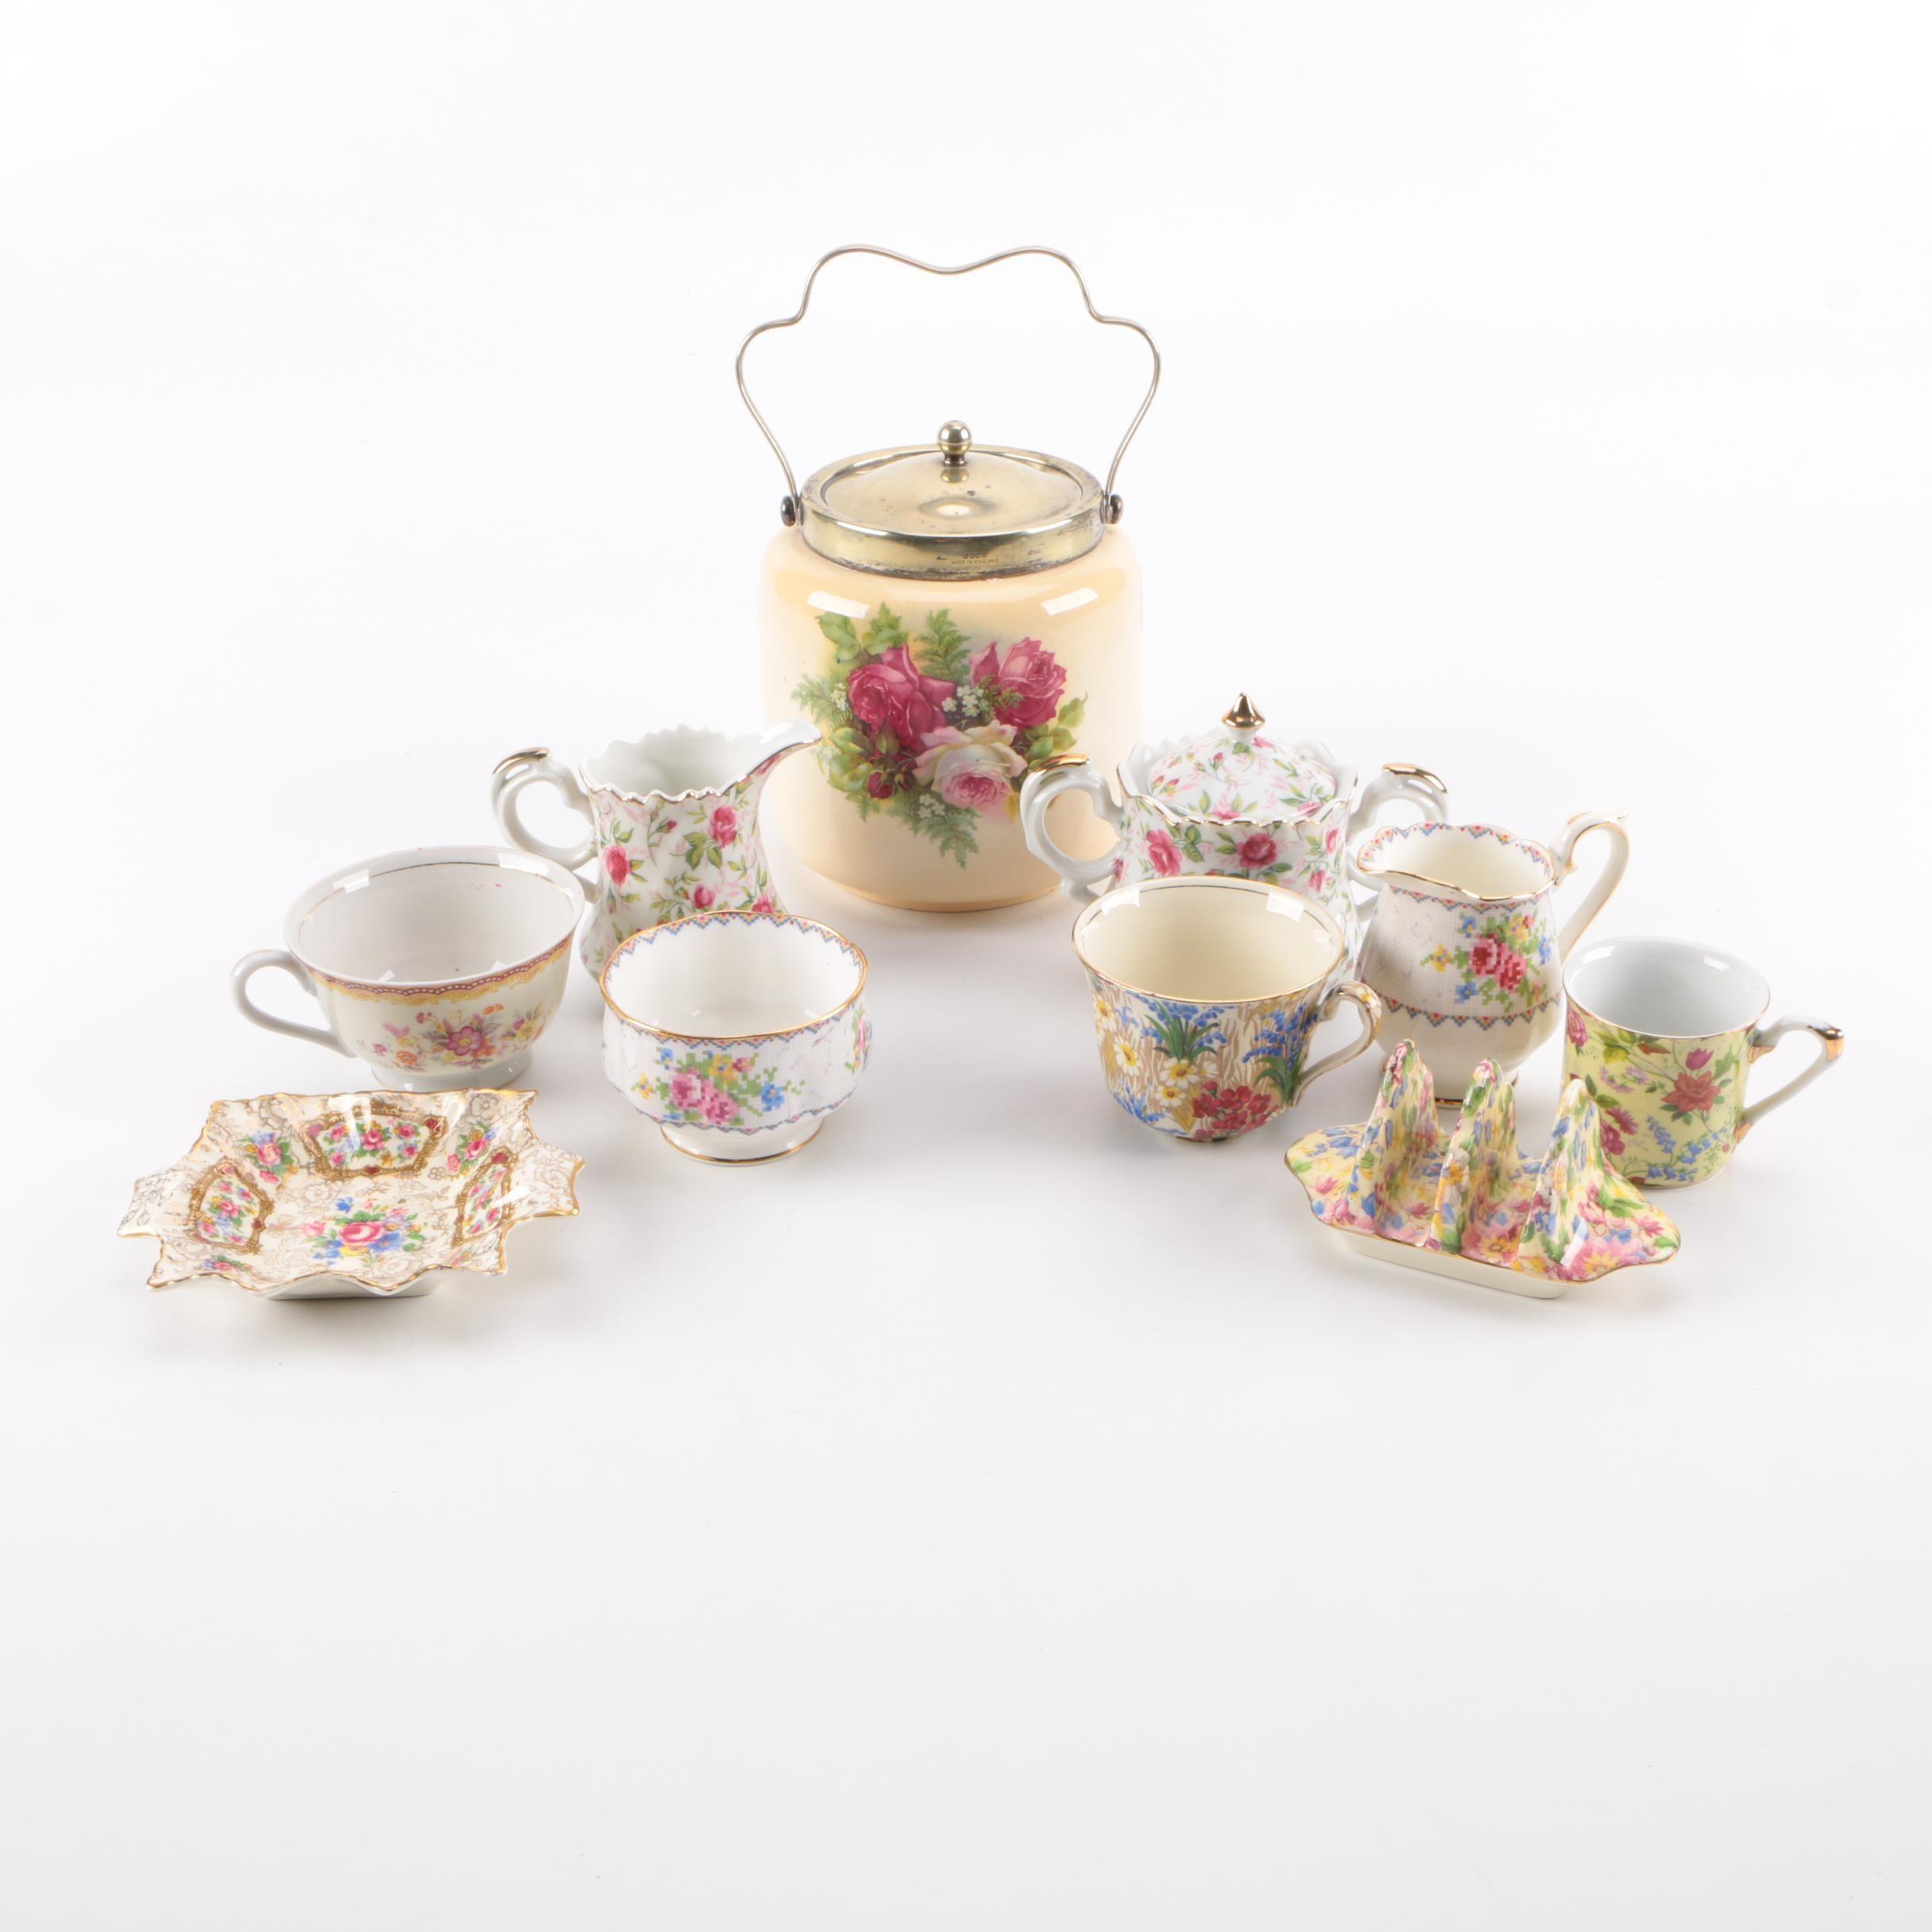 Assorted Floral Motif Ceramic Serveware